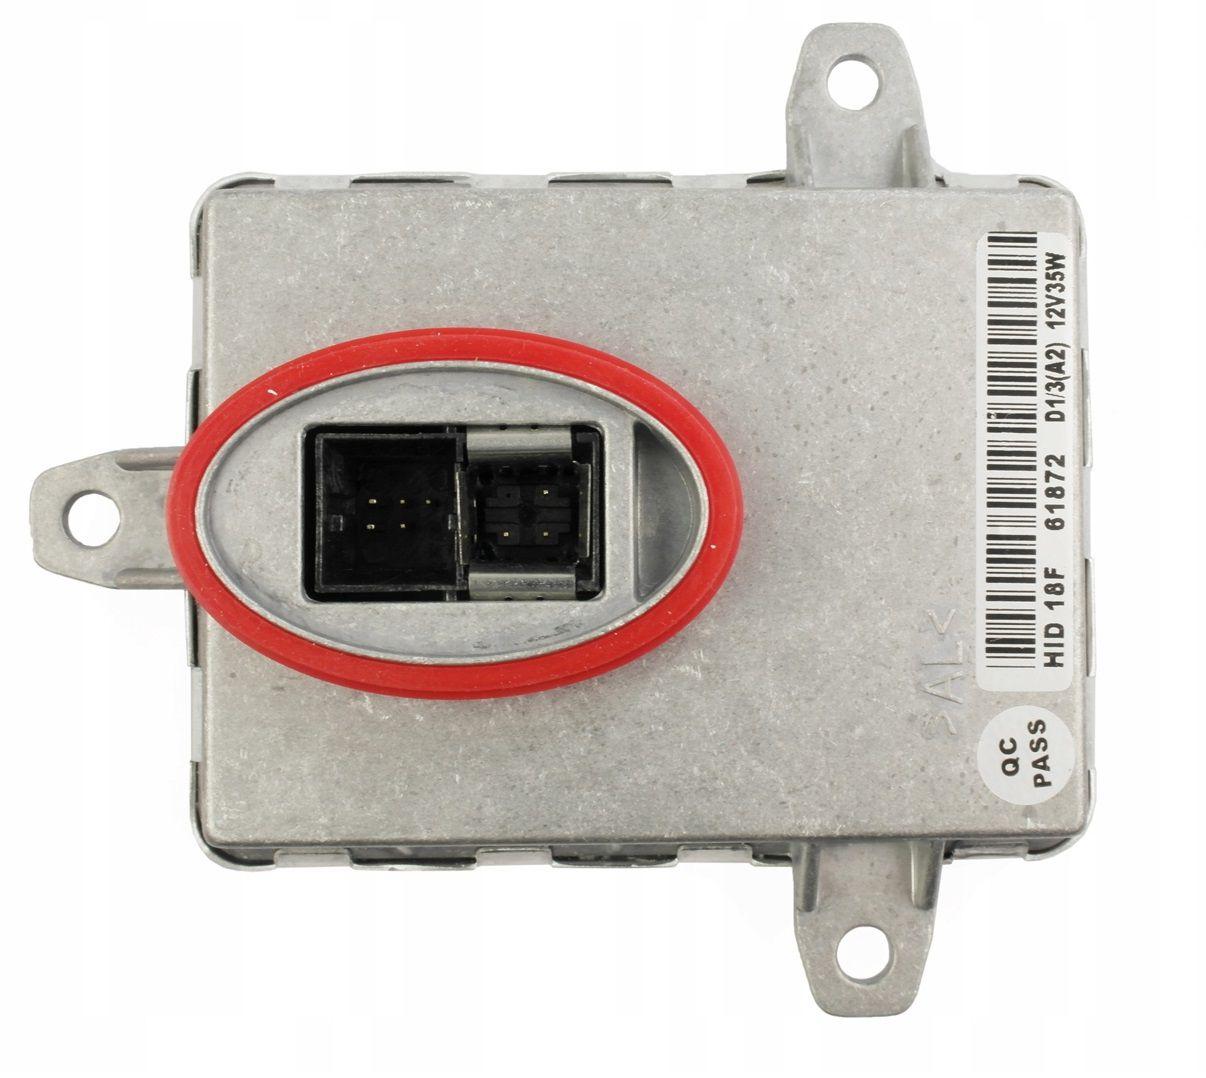 Reator Xenon Oem 130732931201 A15